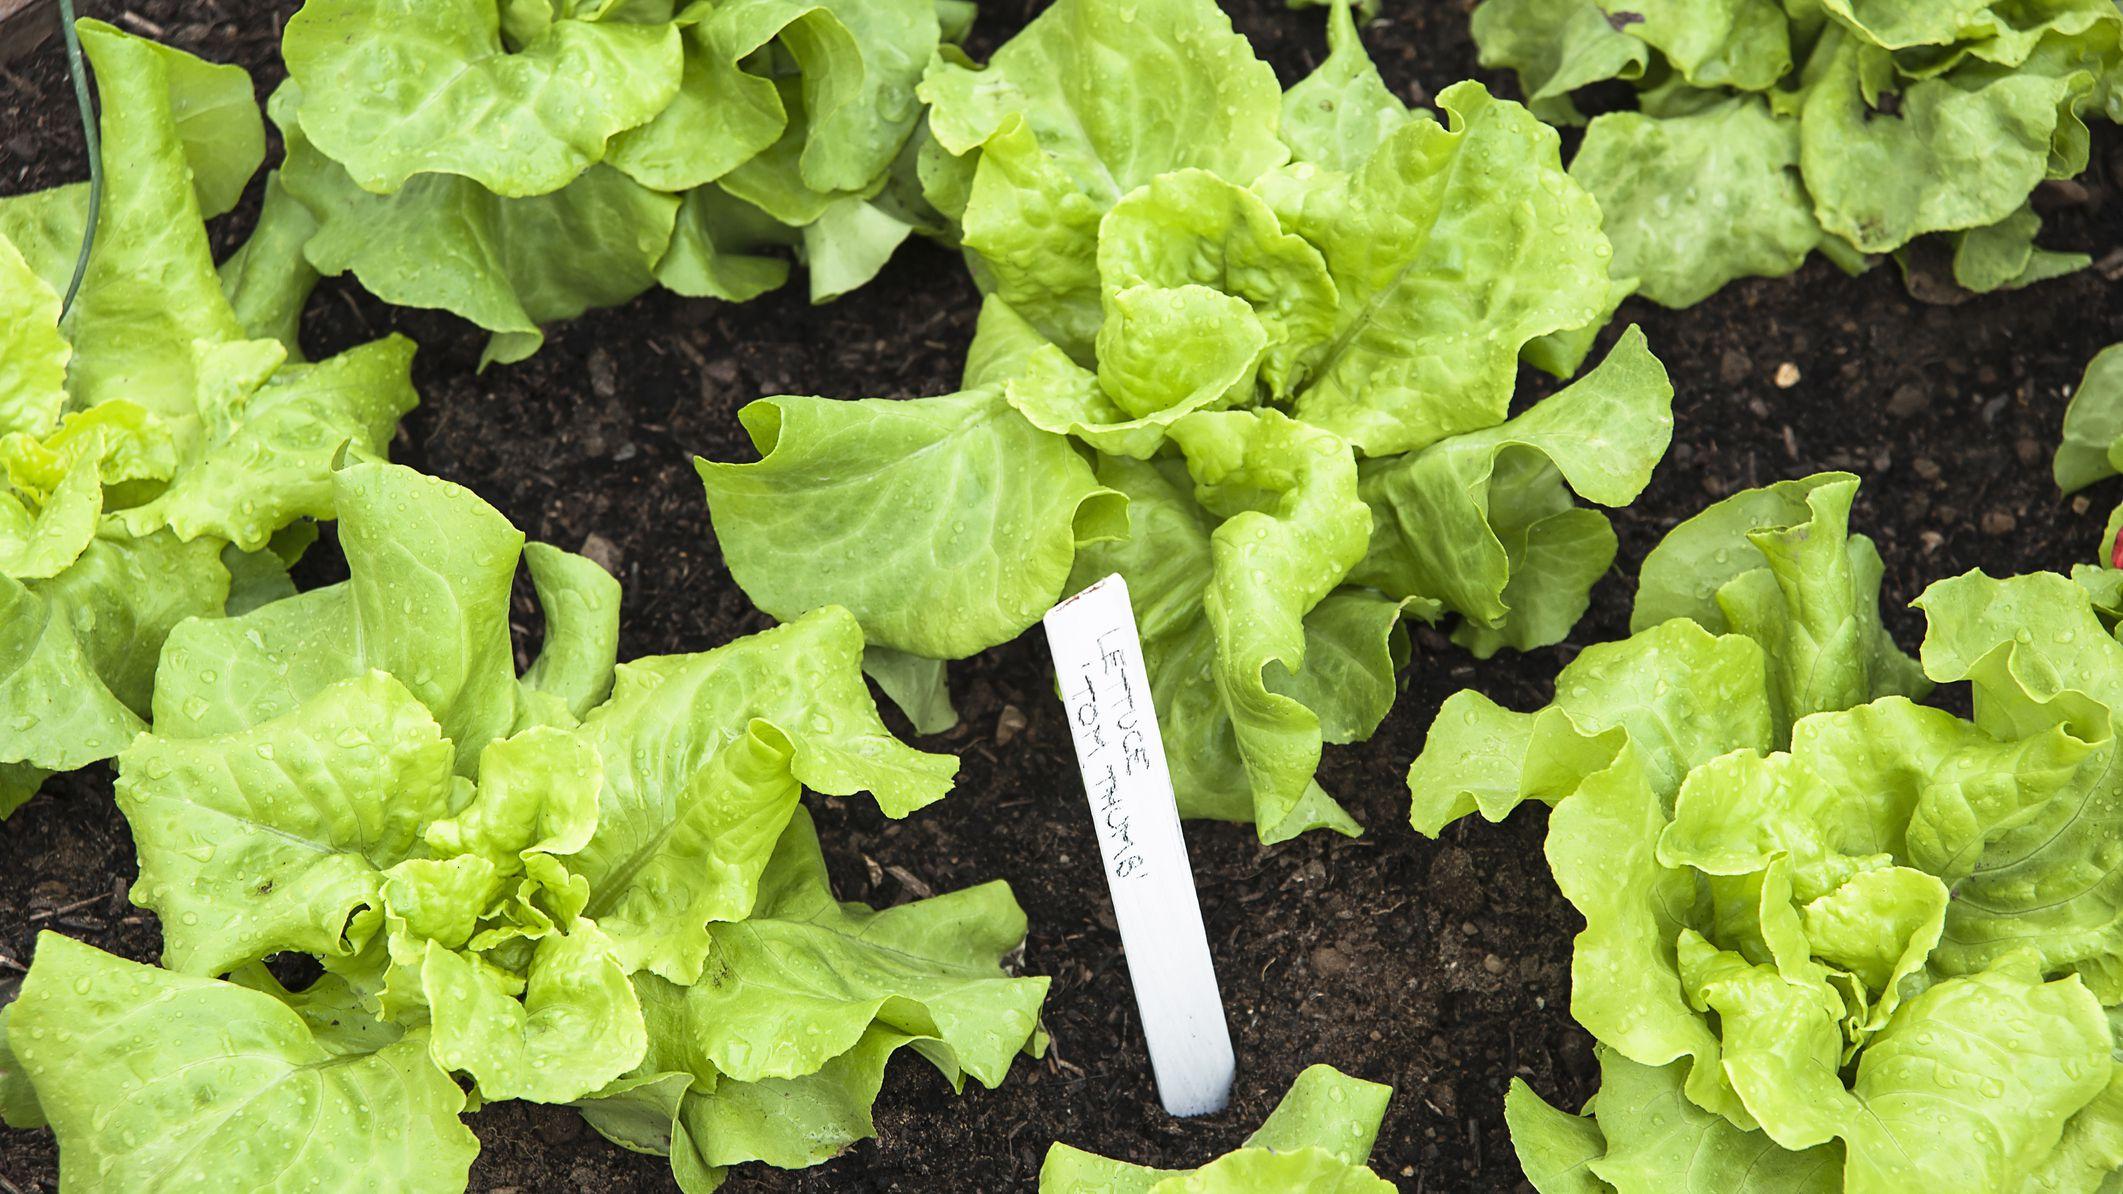 Lettuce Growing In The Heat Of Summer